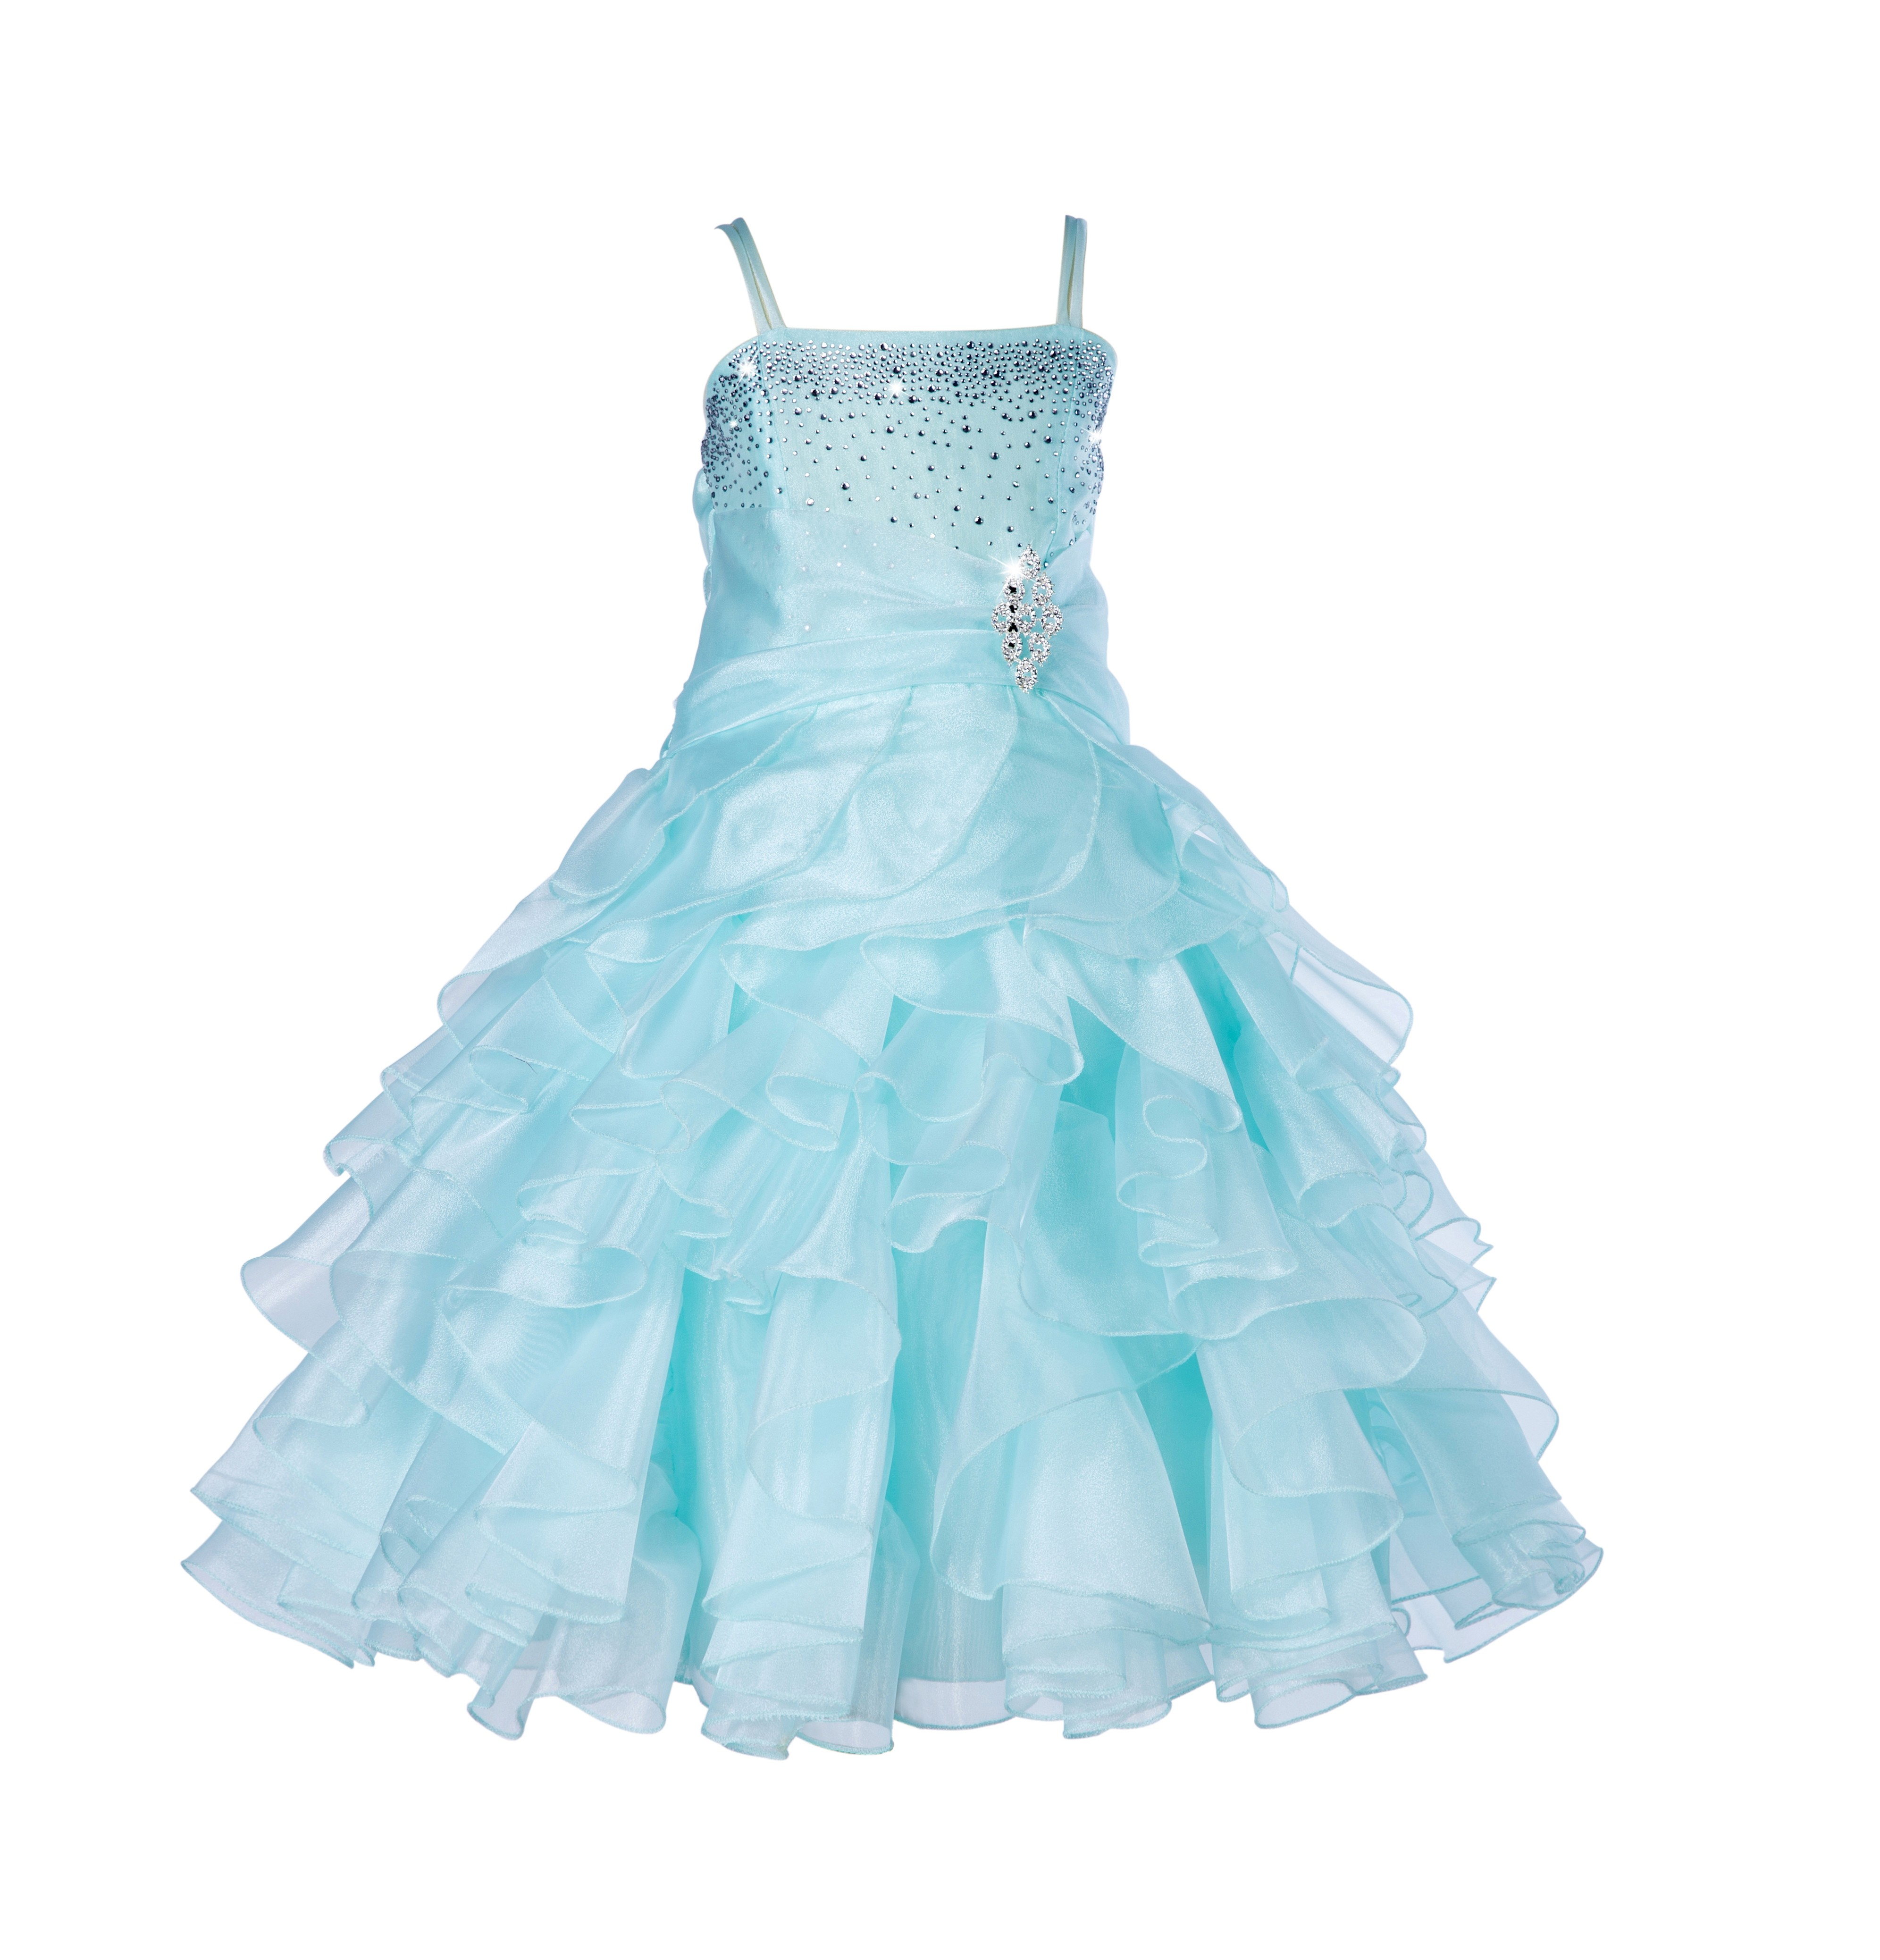 Mint Rhinestone Organza Layers Flower Girl Dress Elegant Stunning 164S